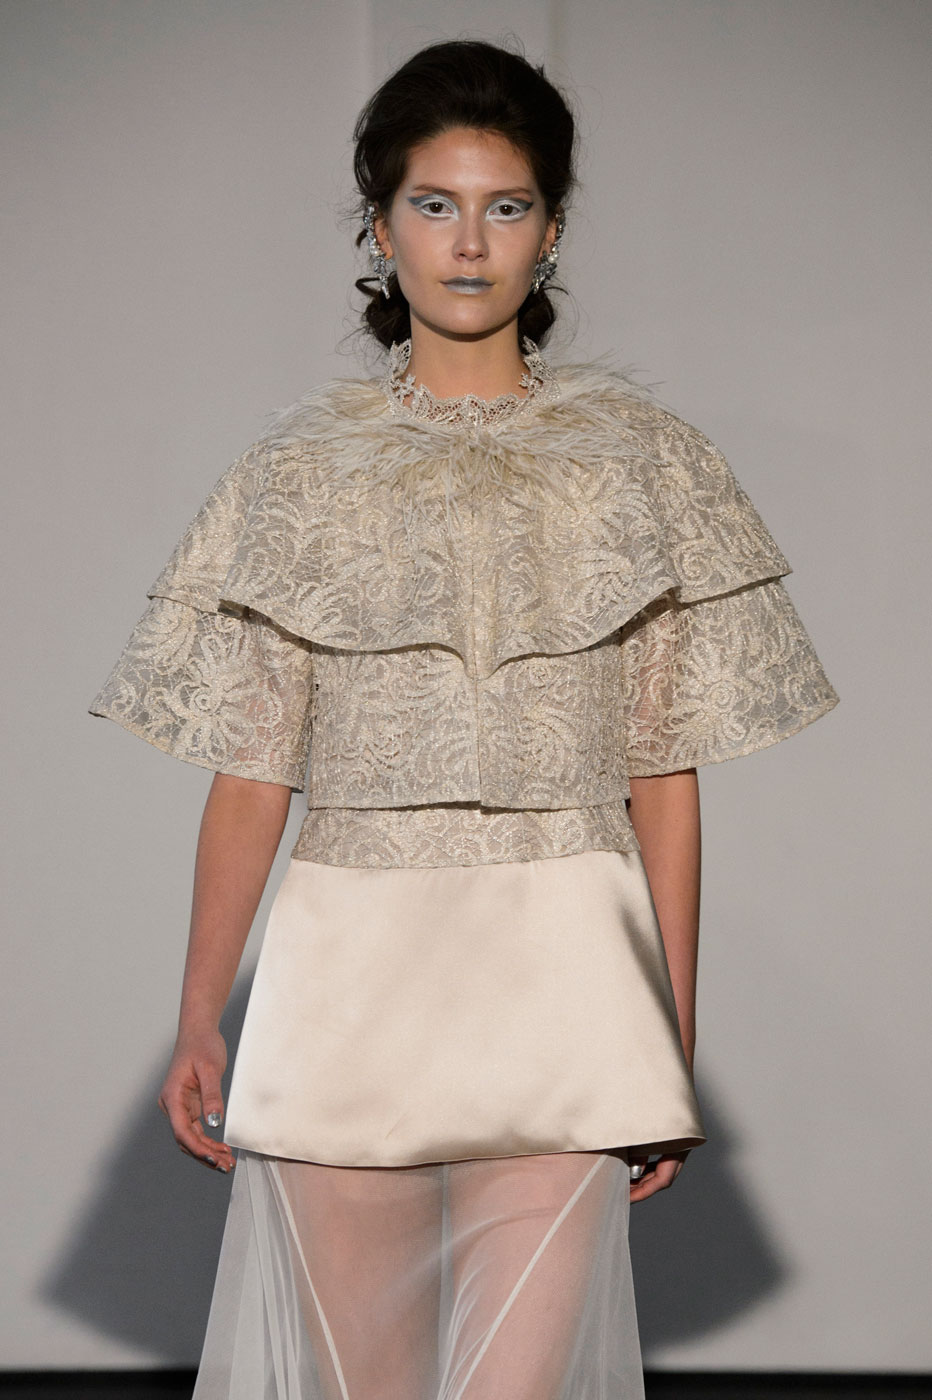 Busardi-fashion-runway-show-haute-couture-paris-spring-2015-the-impression-62